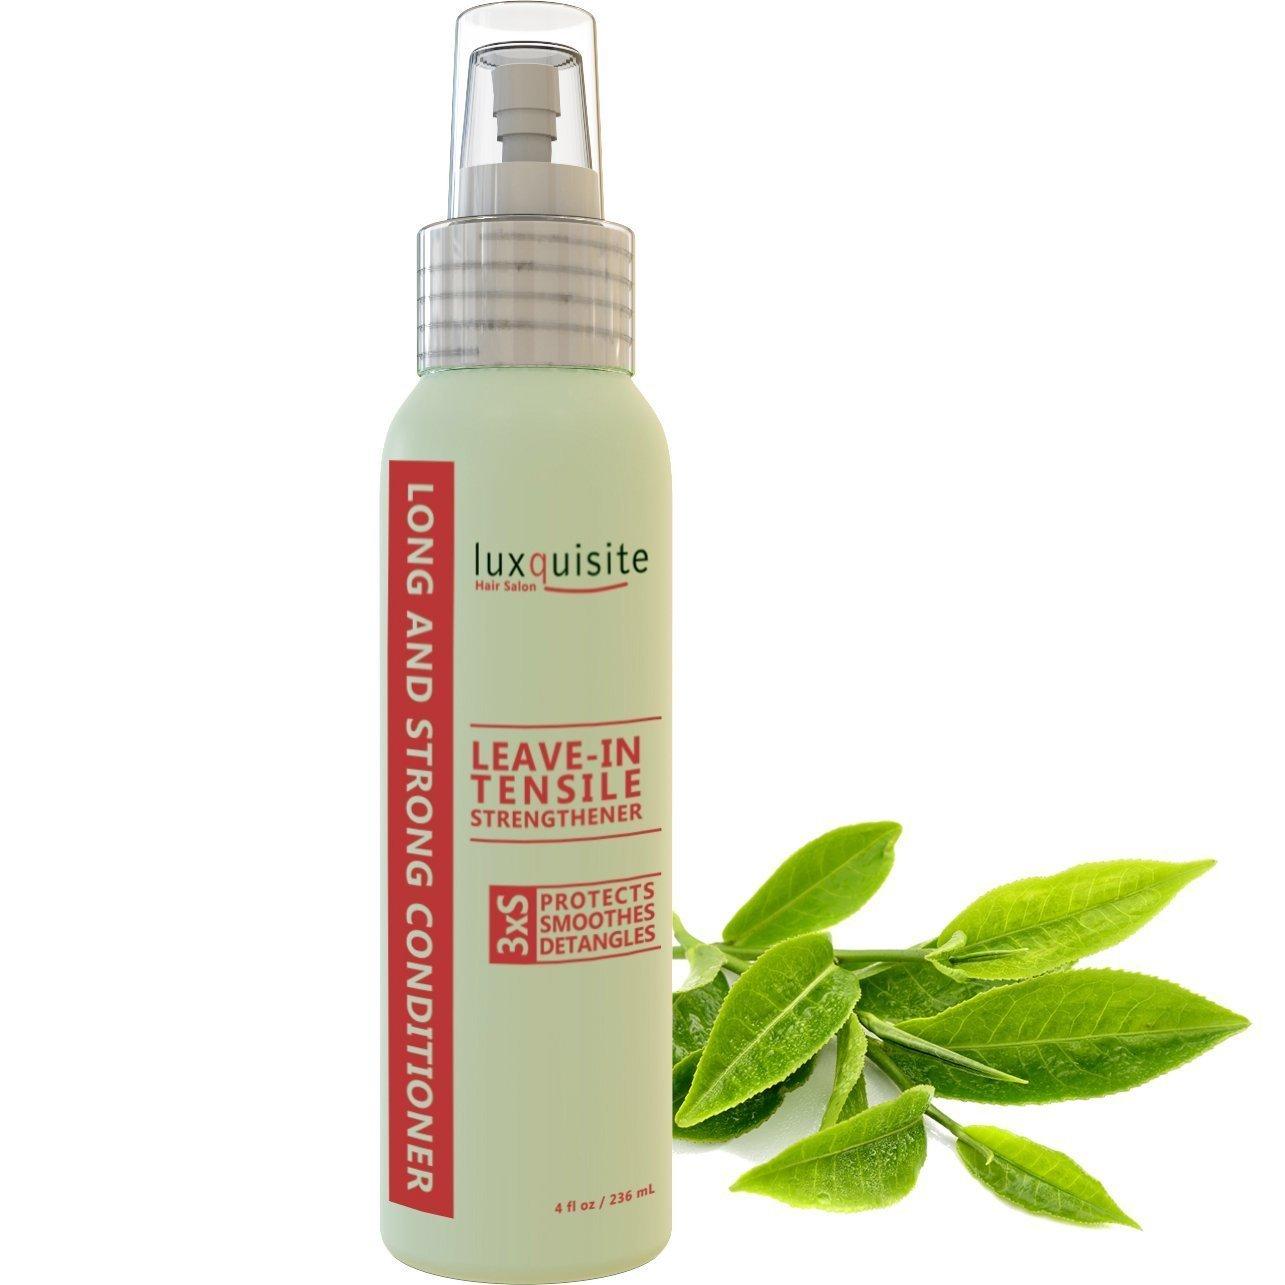 amazon com luxquisite hair salon natural leave in conditioner